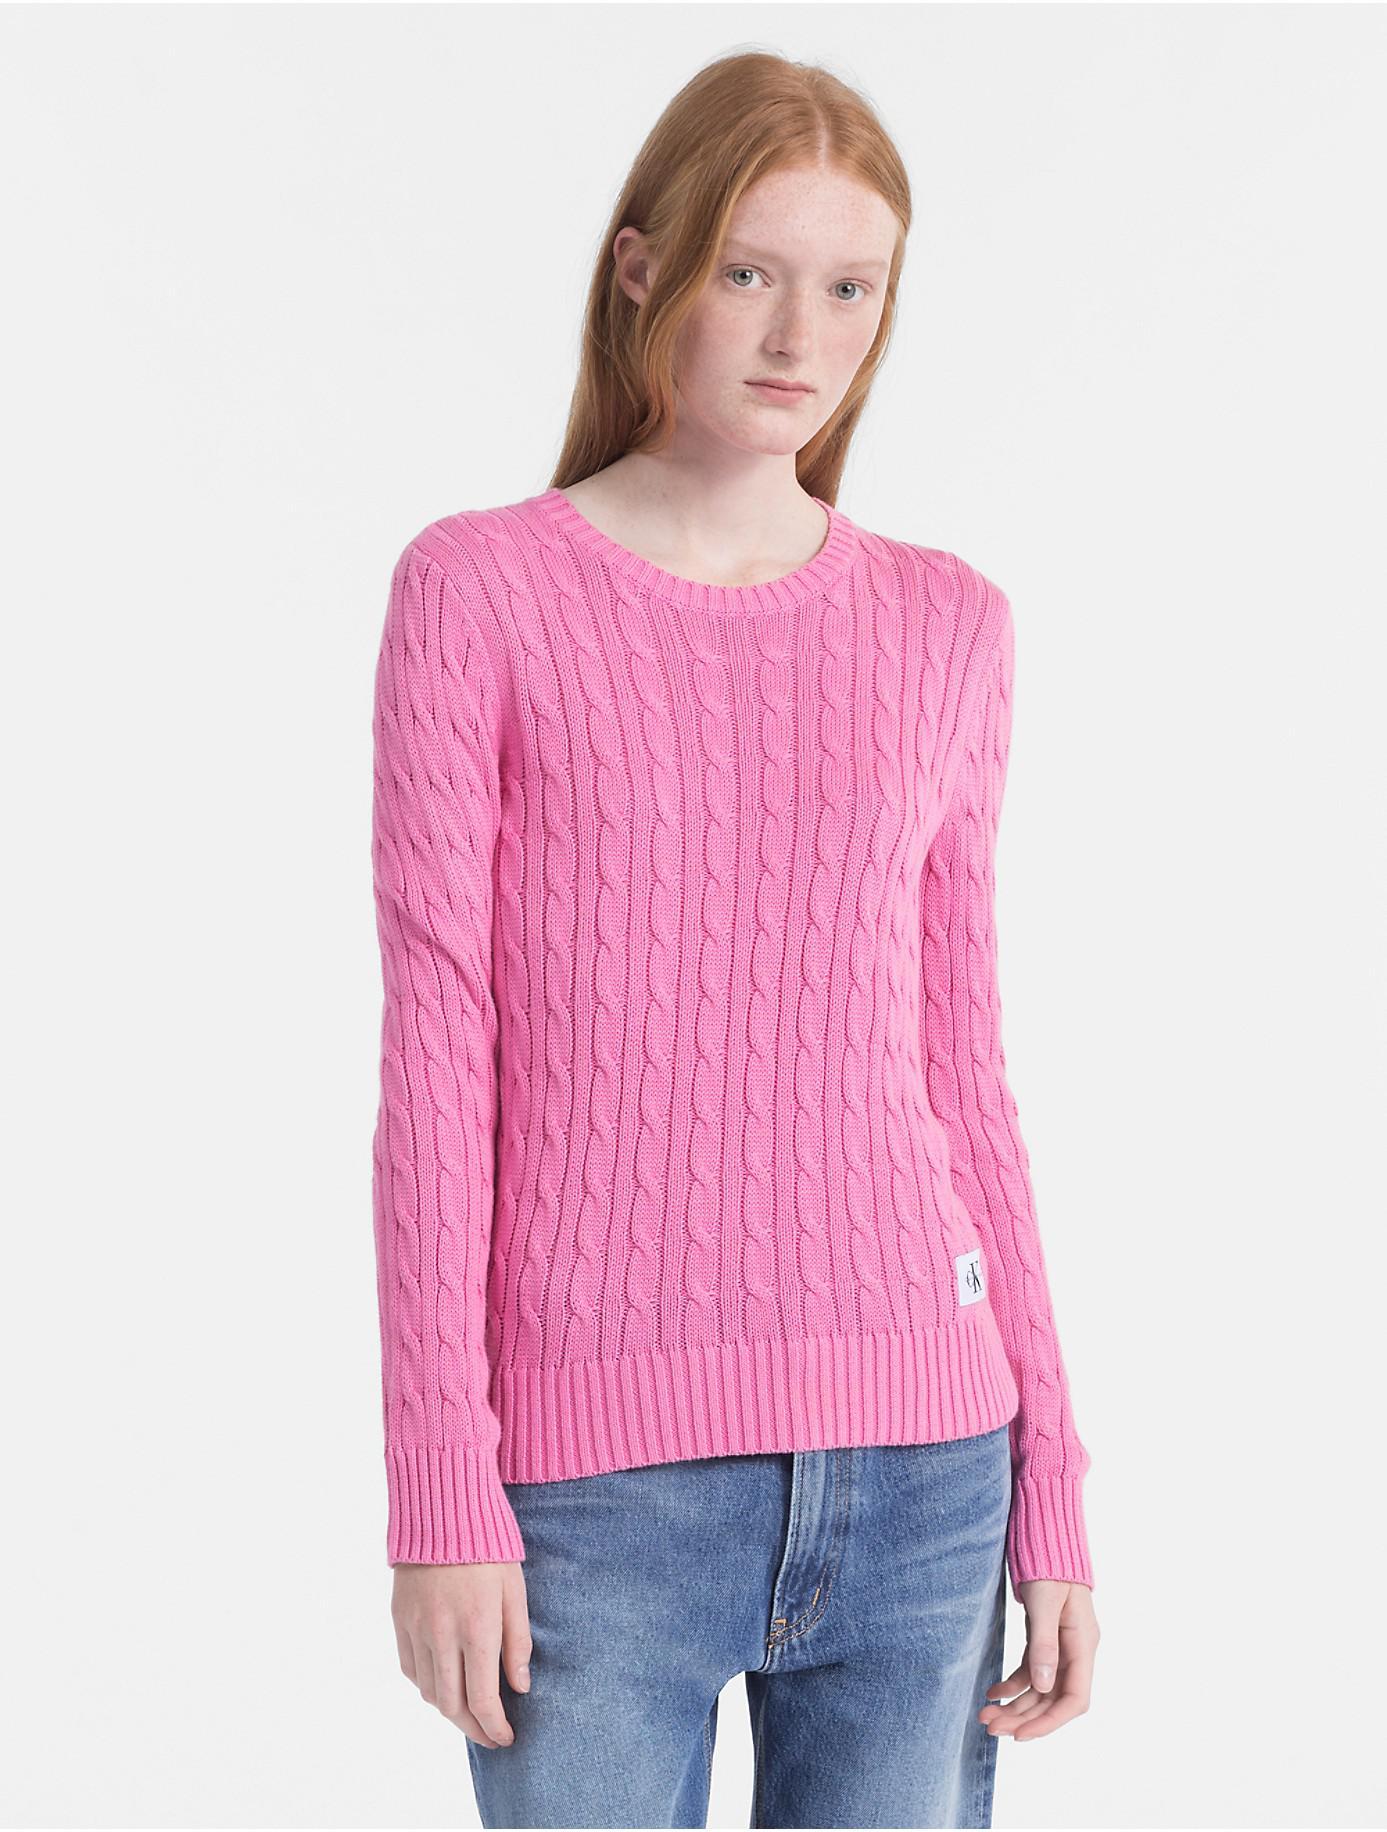 Cheap Shopping Online Pima Cotton Cable Jumper Calvin Klein Quality Free Shipping 5Wgpbrws